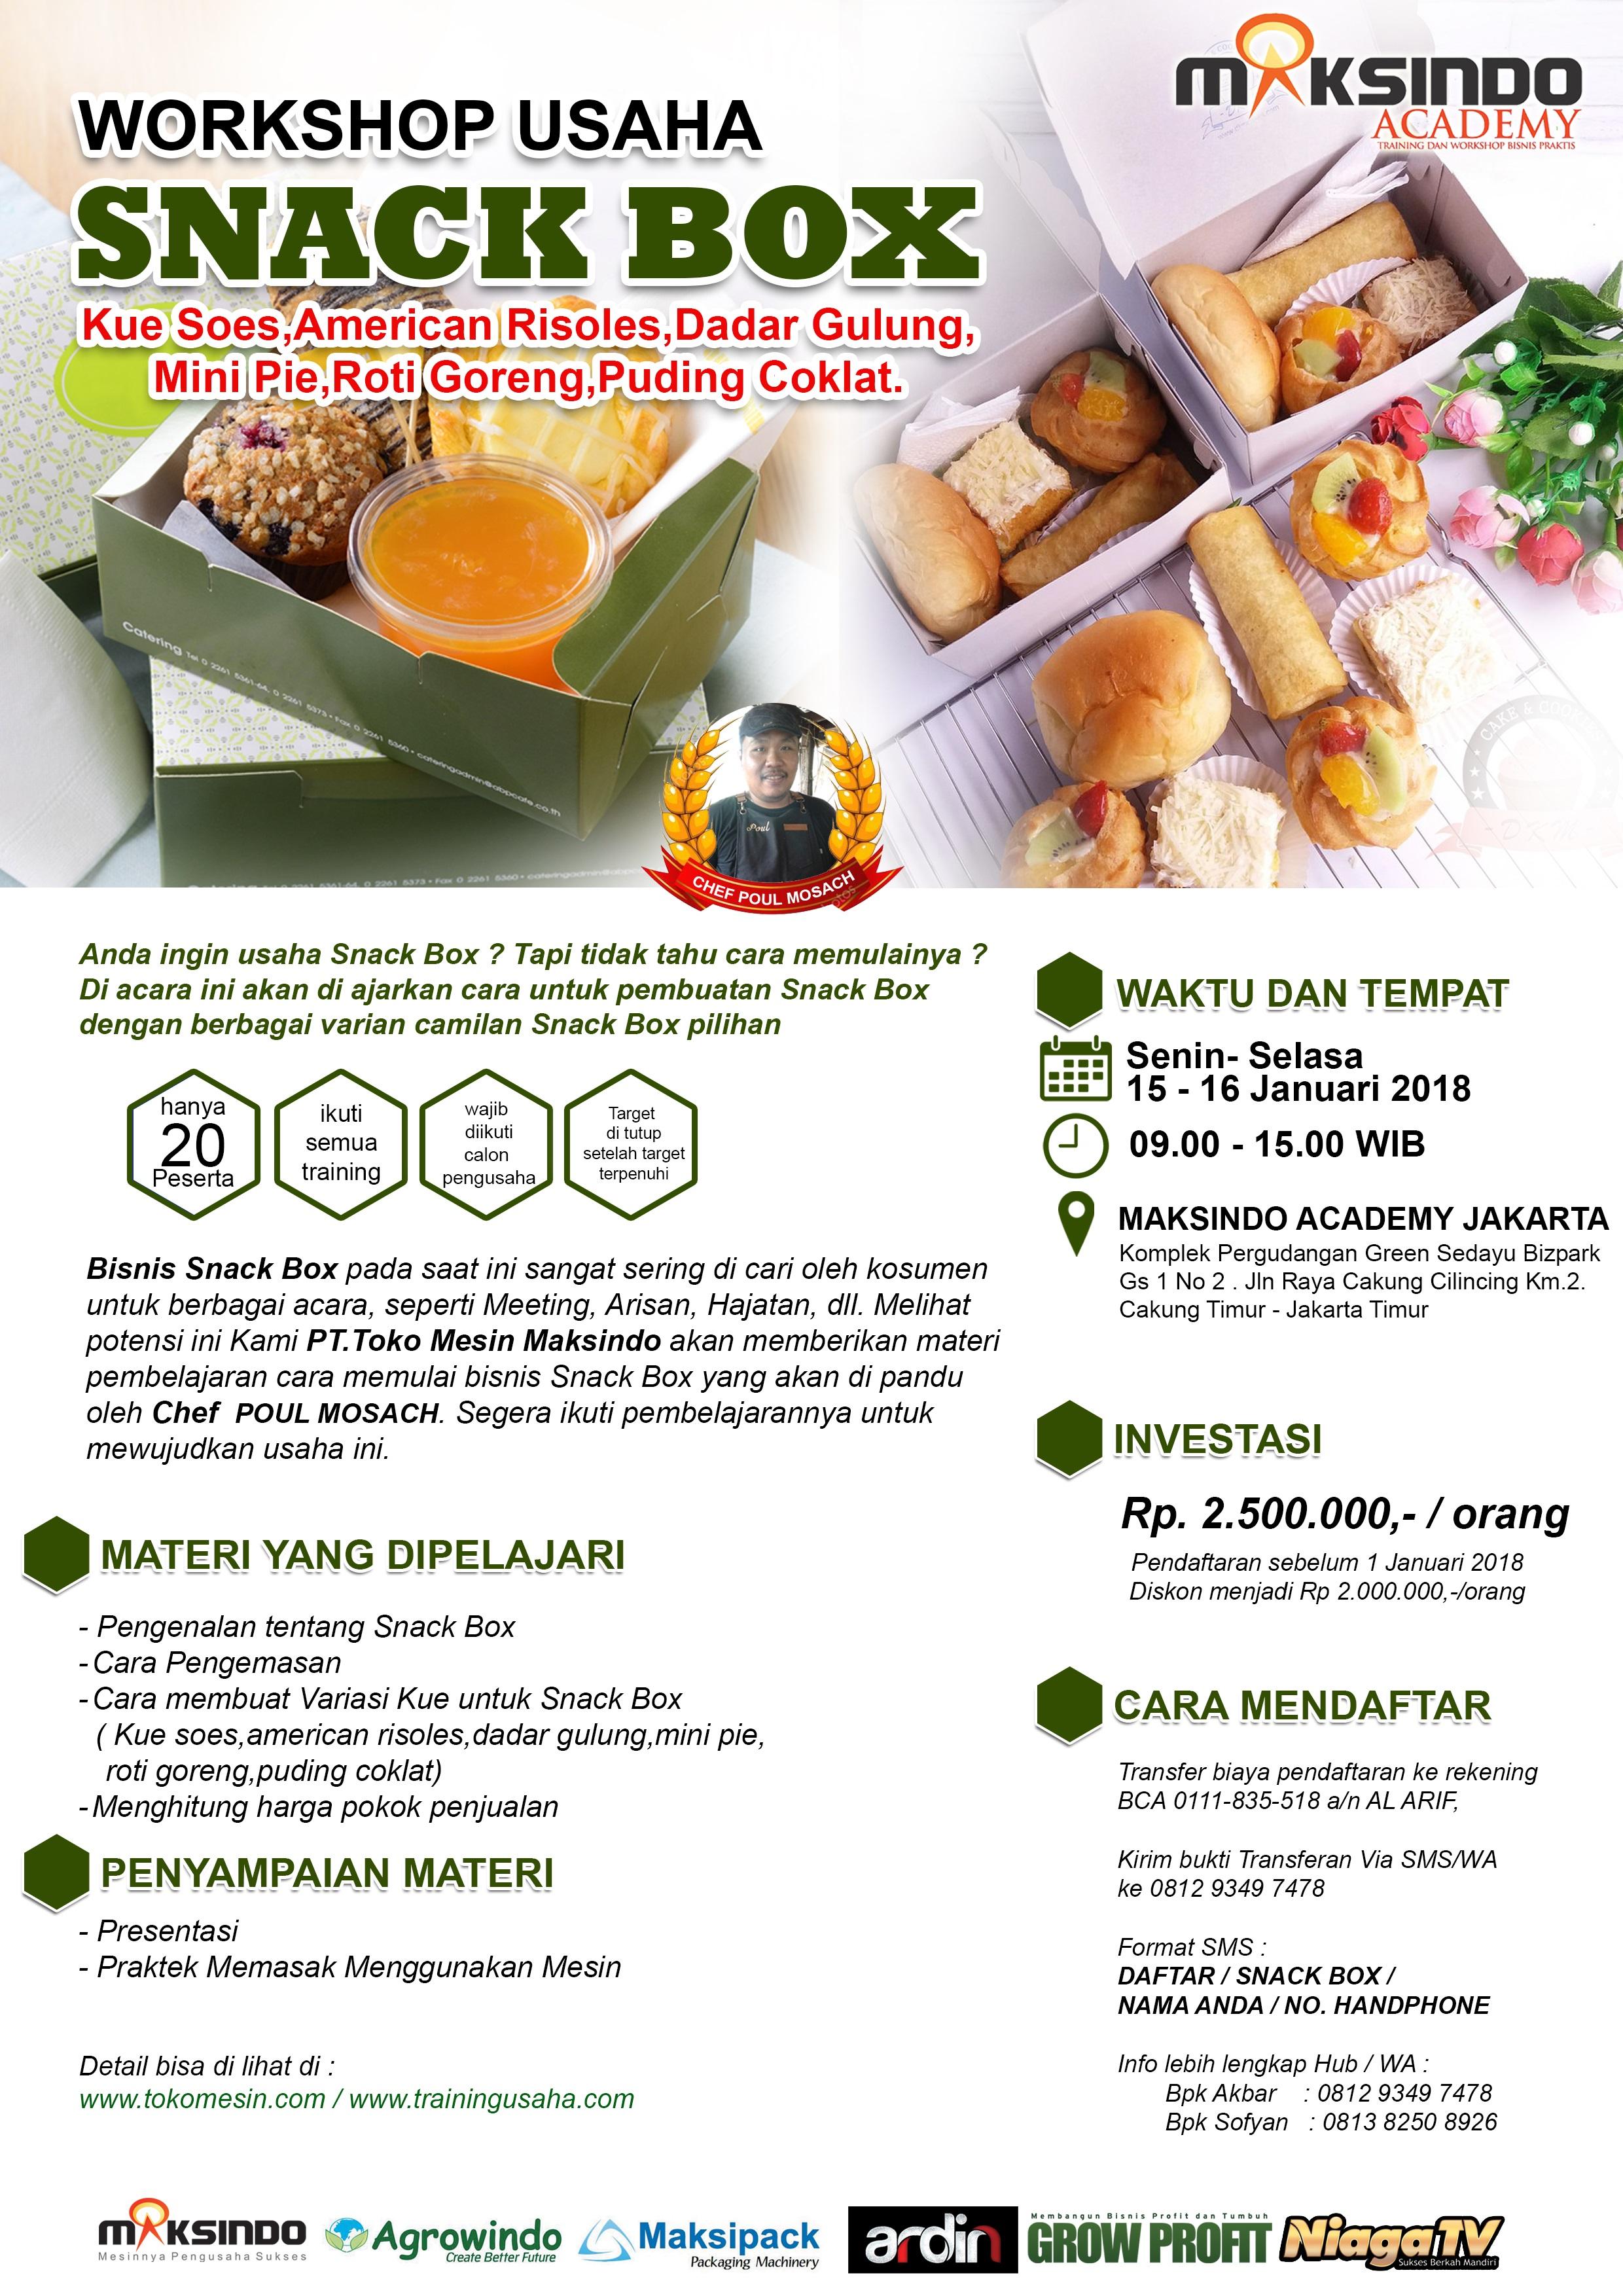 Workshop Usaha Snack Box, 15 – 16 Januari 2017